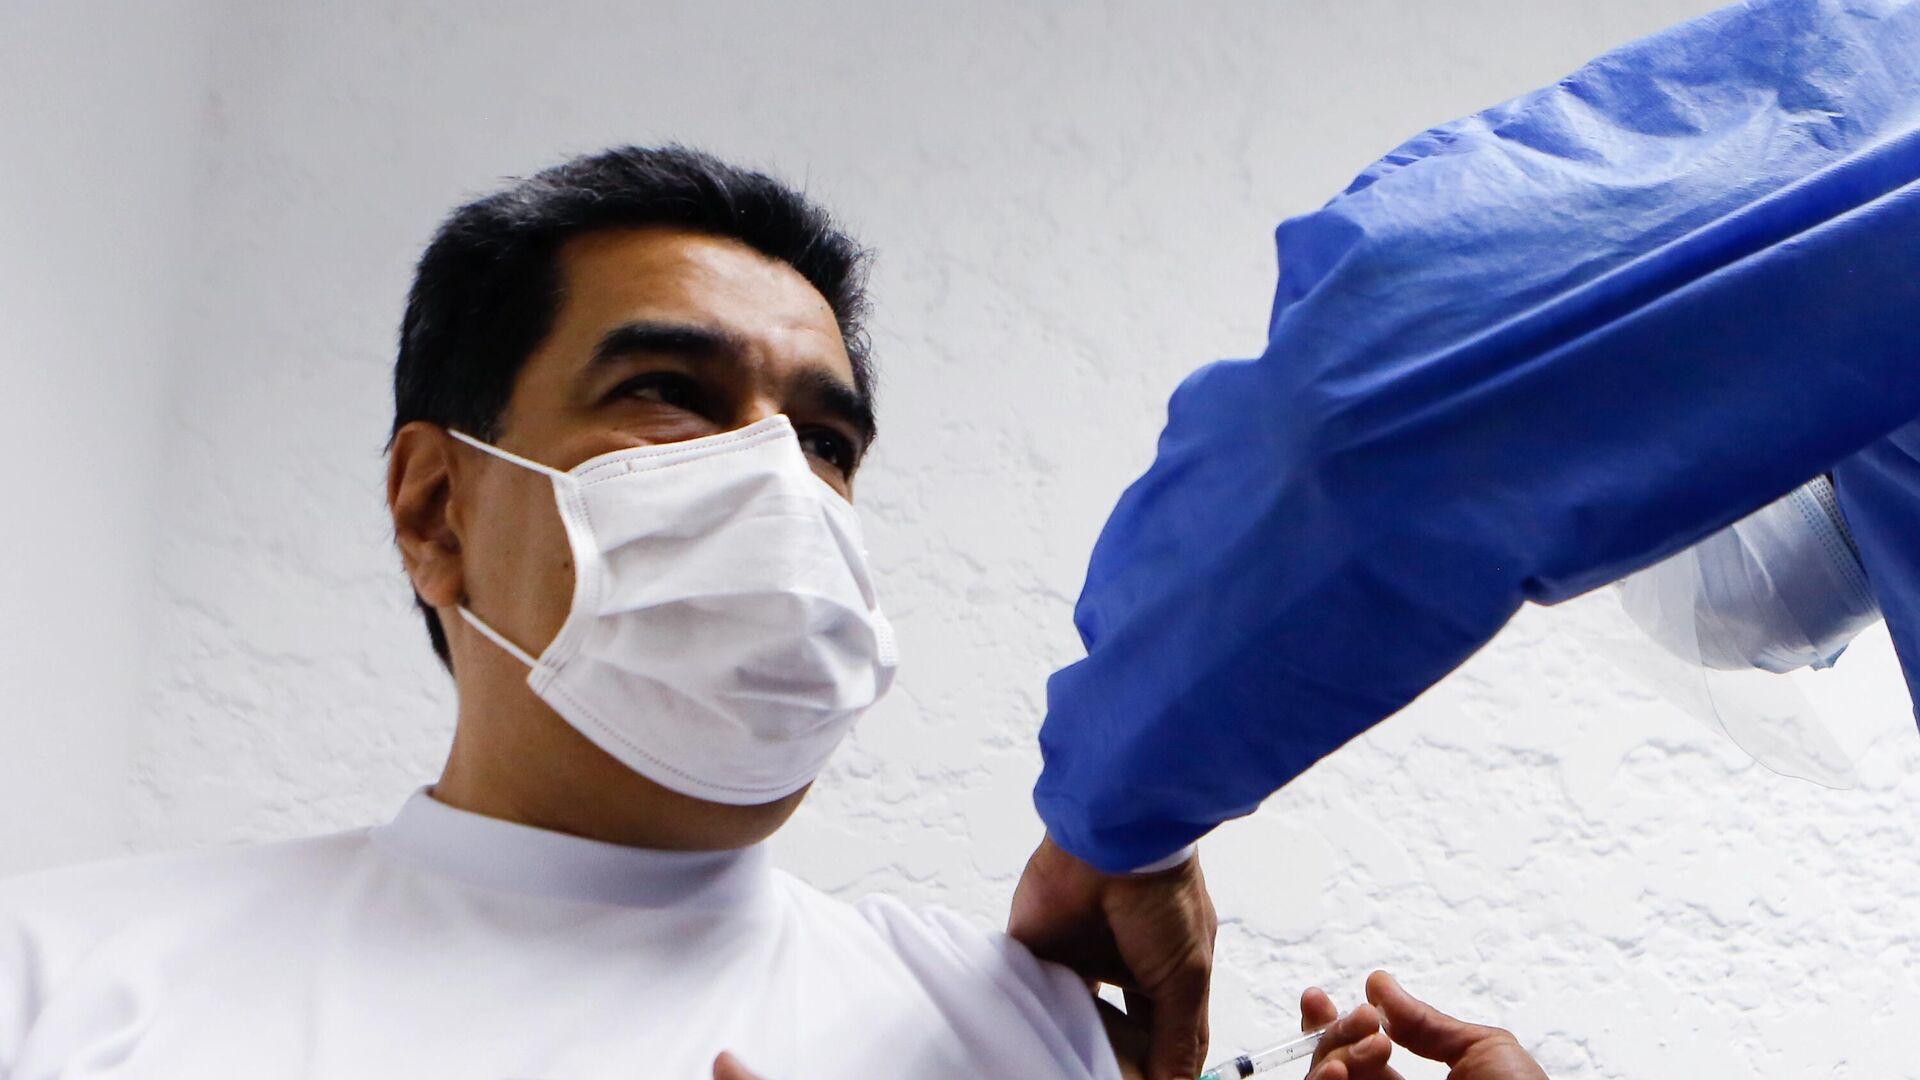 Maduro se coloca la primera dosis de la vacuna Sputnik V  - Sputnik Mundo, 1920, 06.03.2021